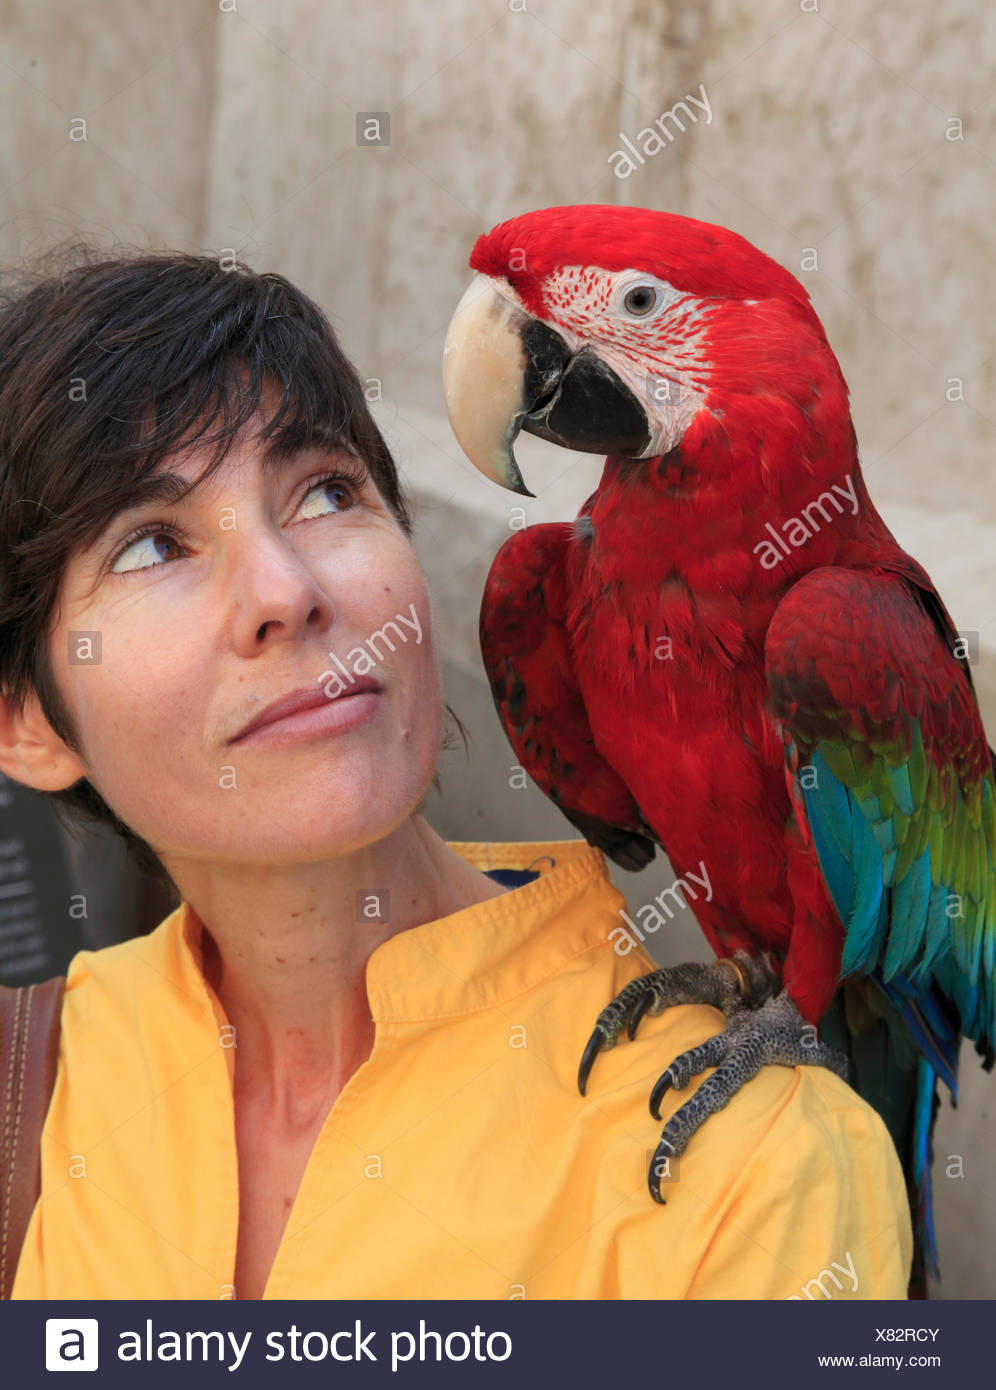 Qatar, Doha, Souq Waqif, bird market, woman with a parrot, - Stock Image